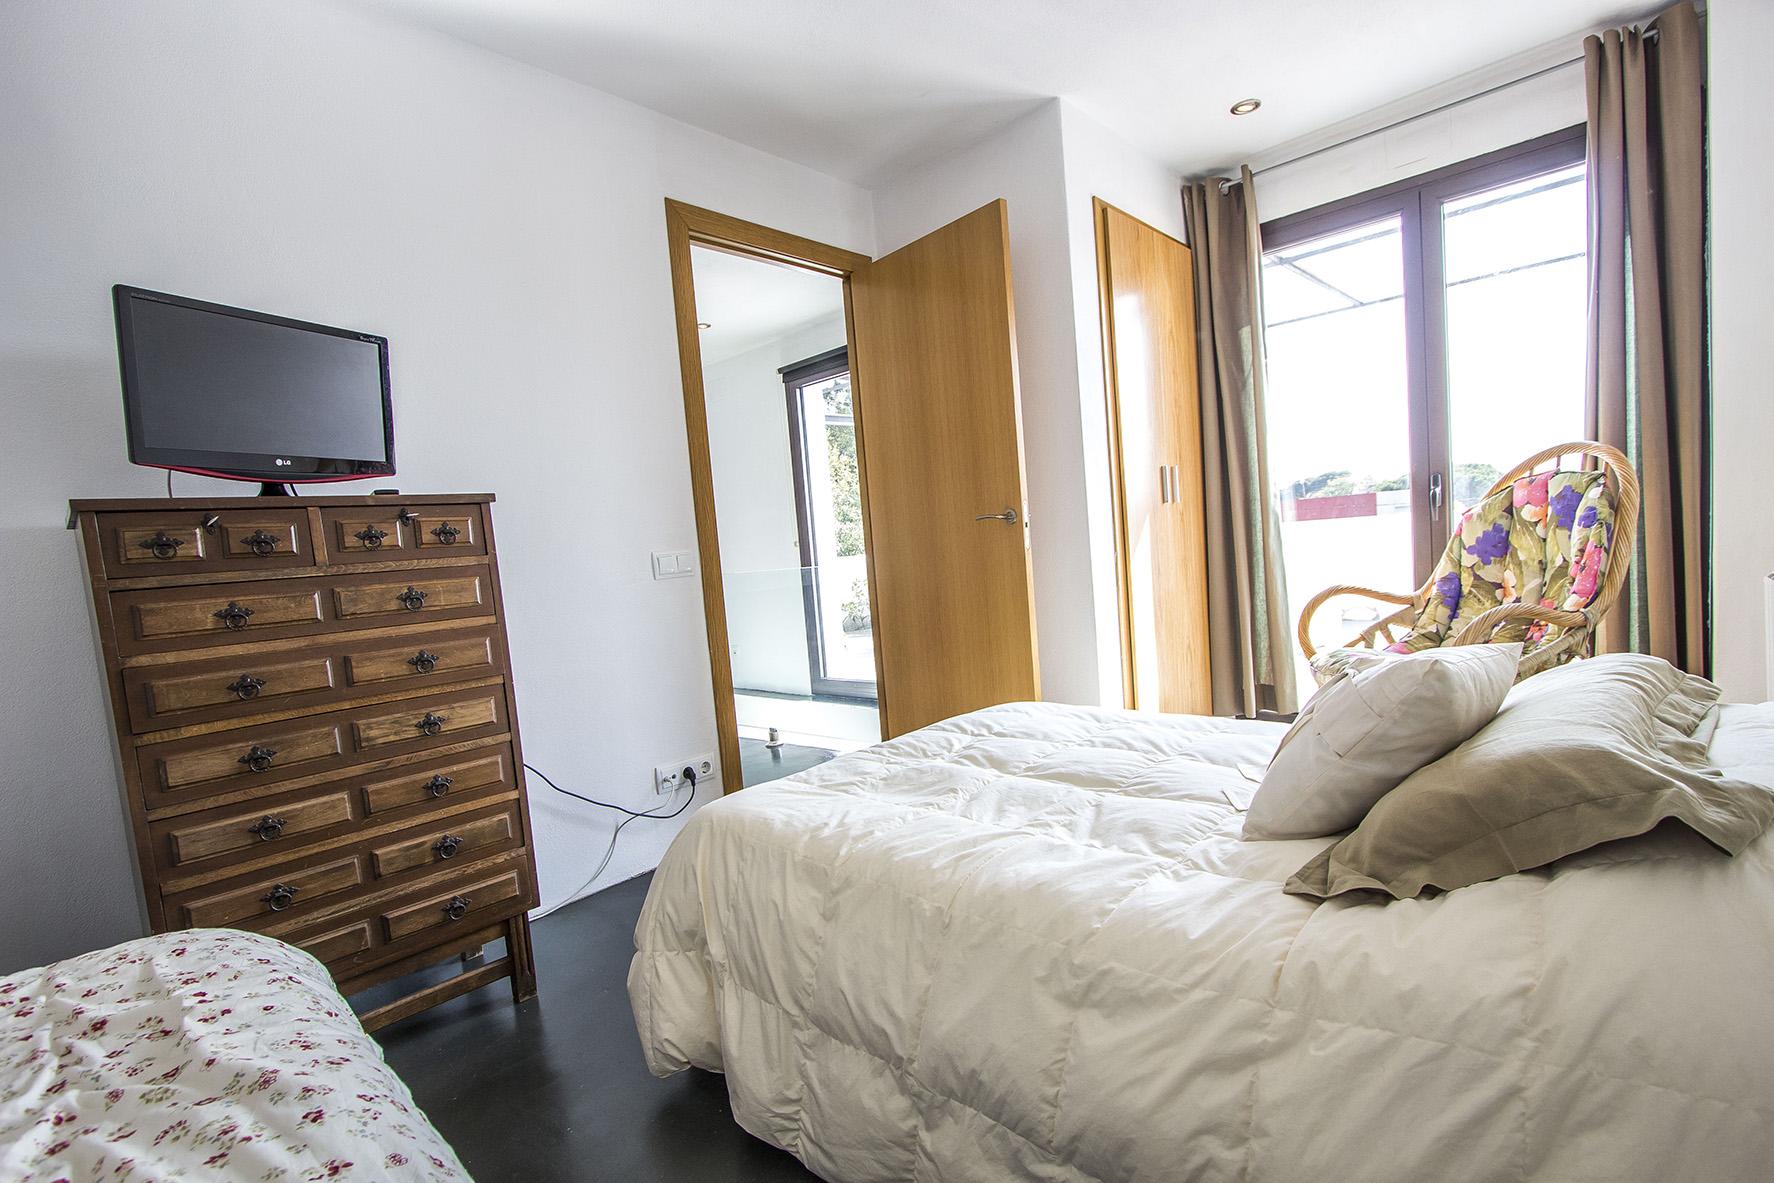 Ferienhaus Catalunya Casas: Serene villa in Sils, 20 km to Costa Brava beaches! (1890922), Les Mallorquines, Girona, Katalonien, Spanien, Bild 33